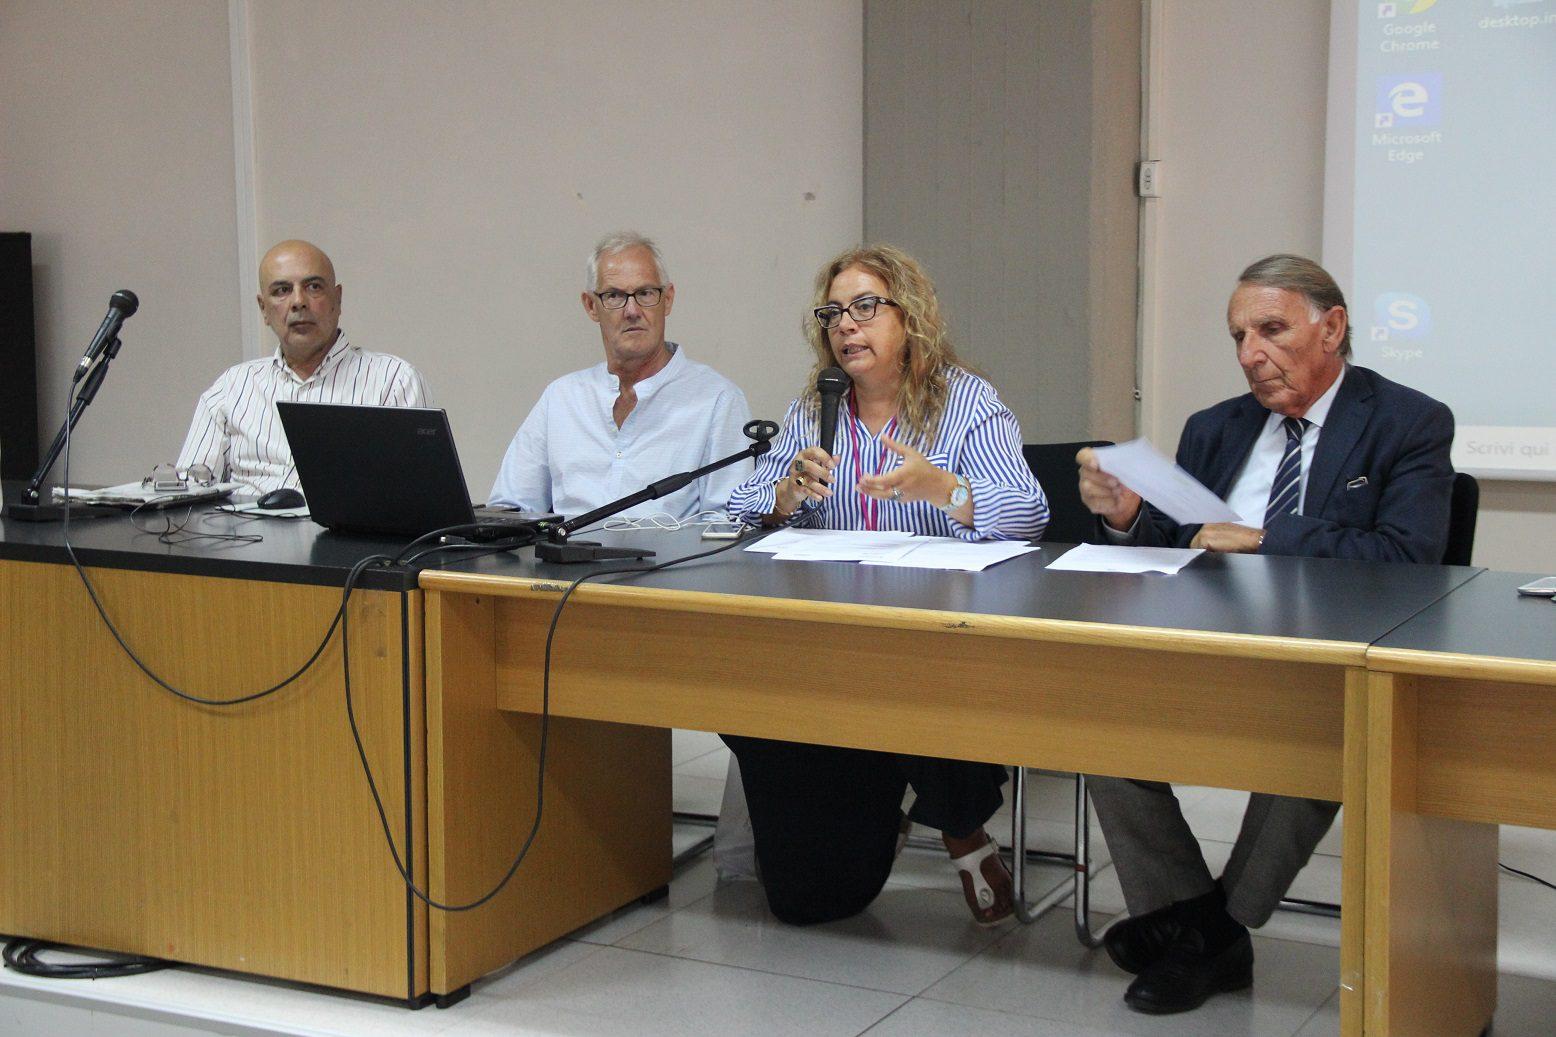 conferenza stampa Editori sardi